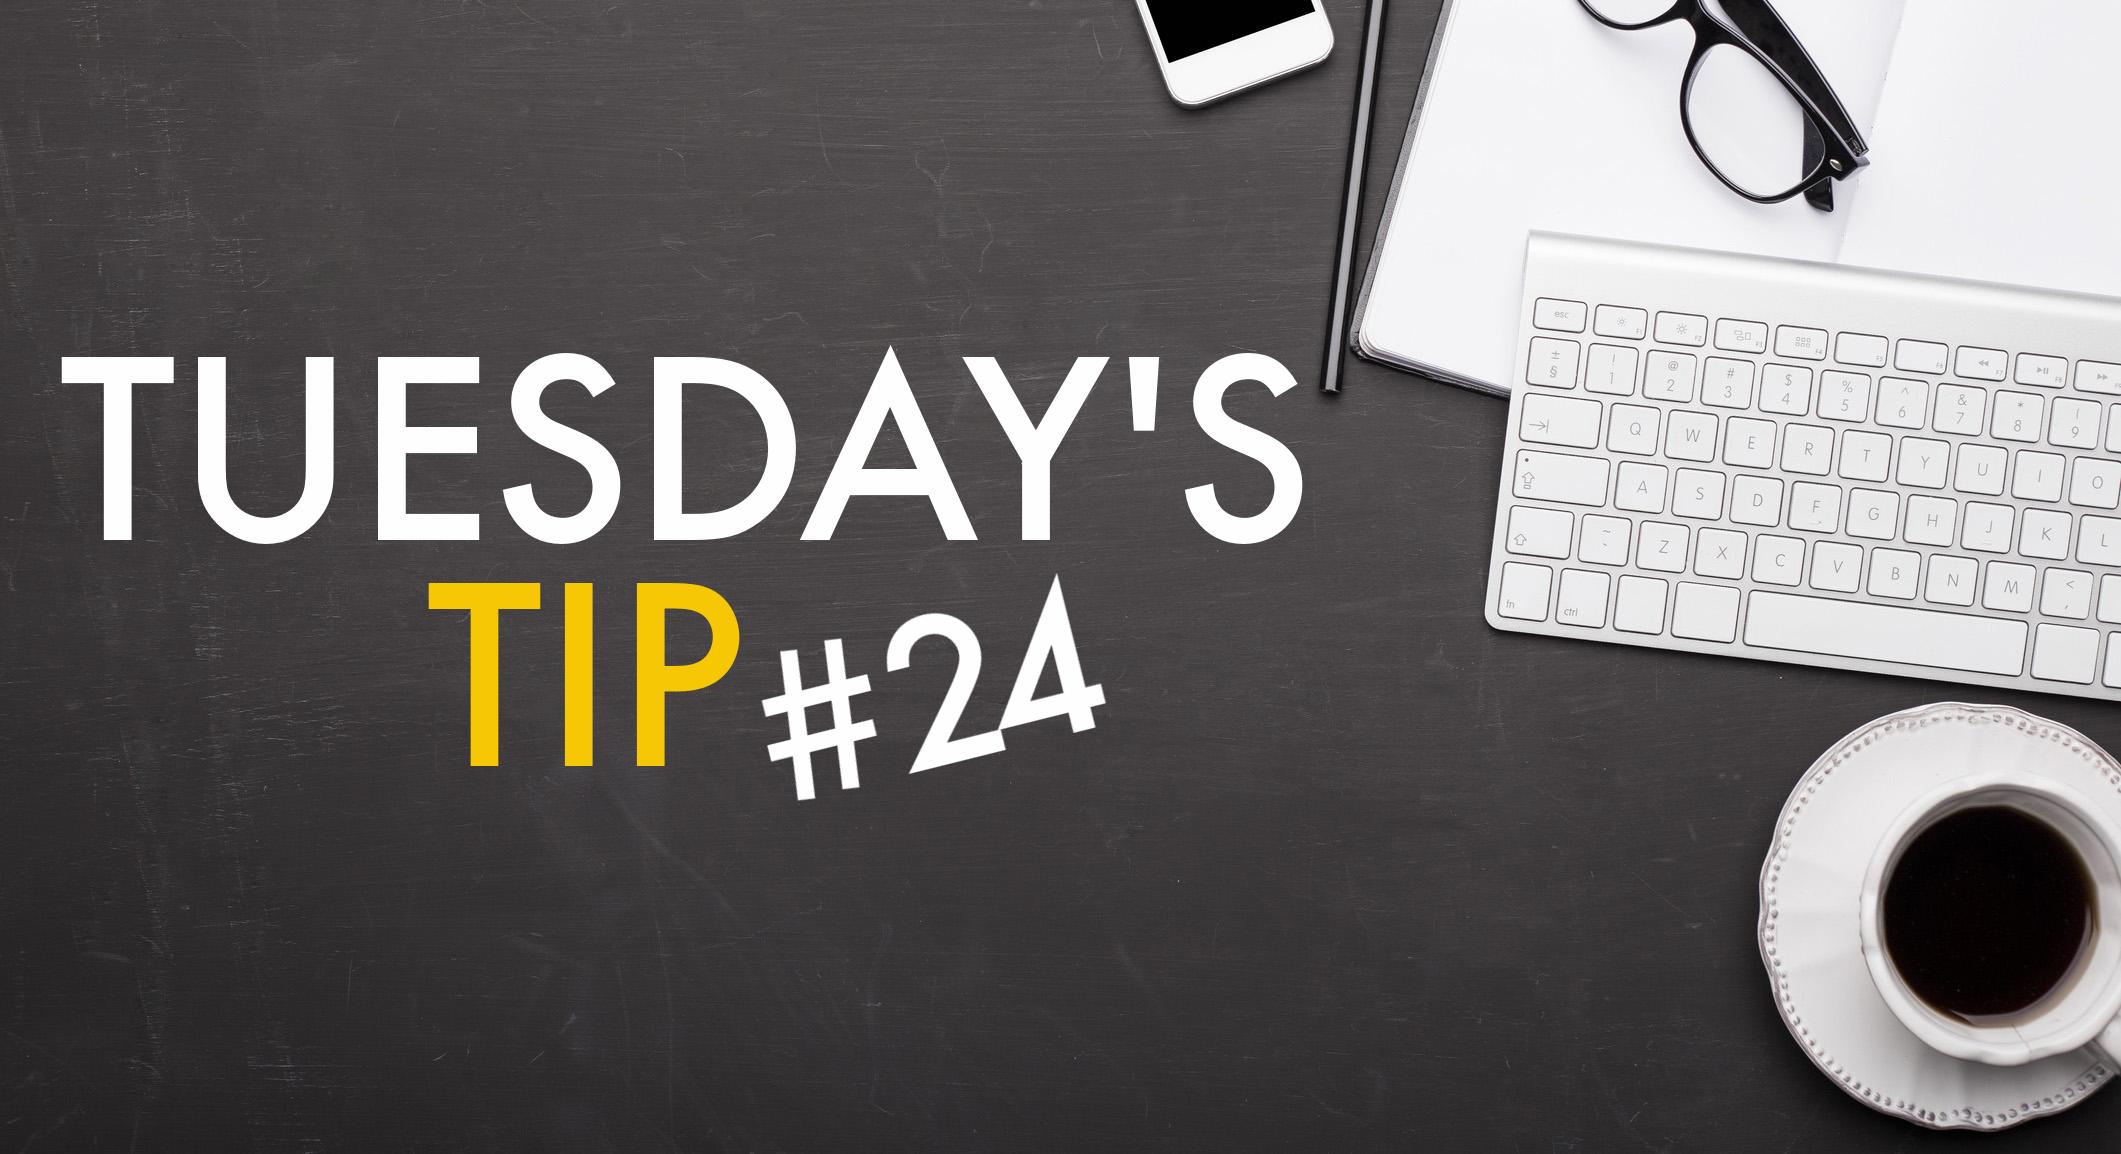 Tuesdays Tip 24